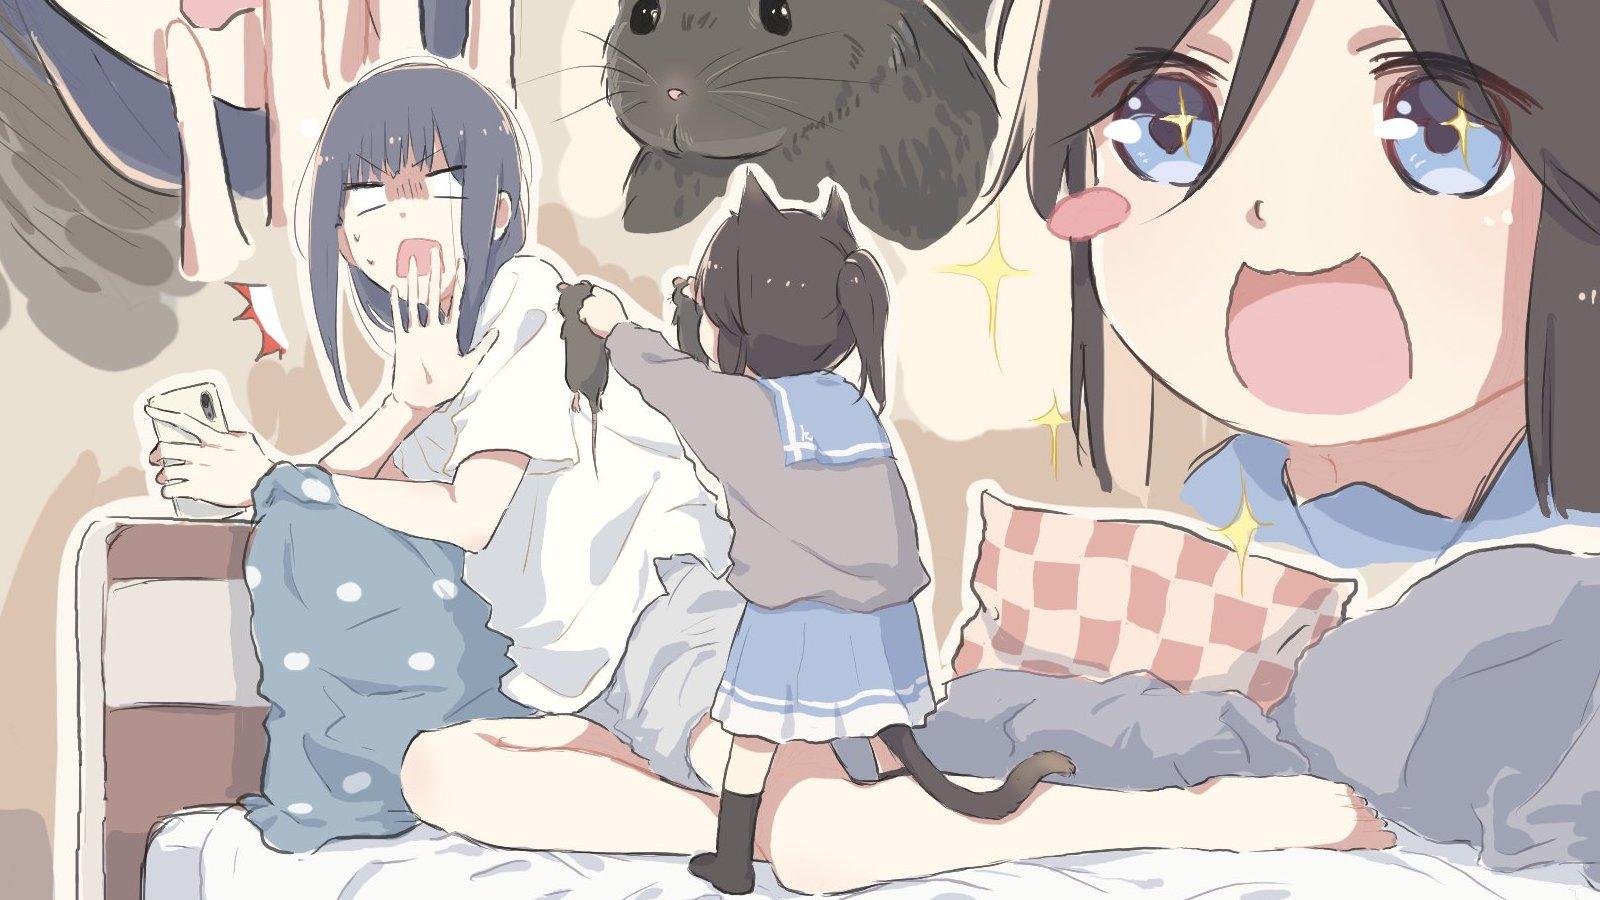 Lyytoaoitori's Catgirl Images